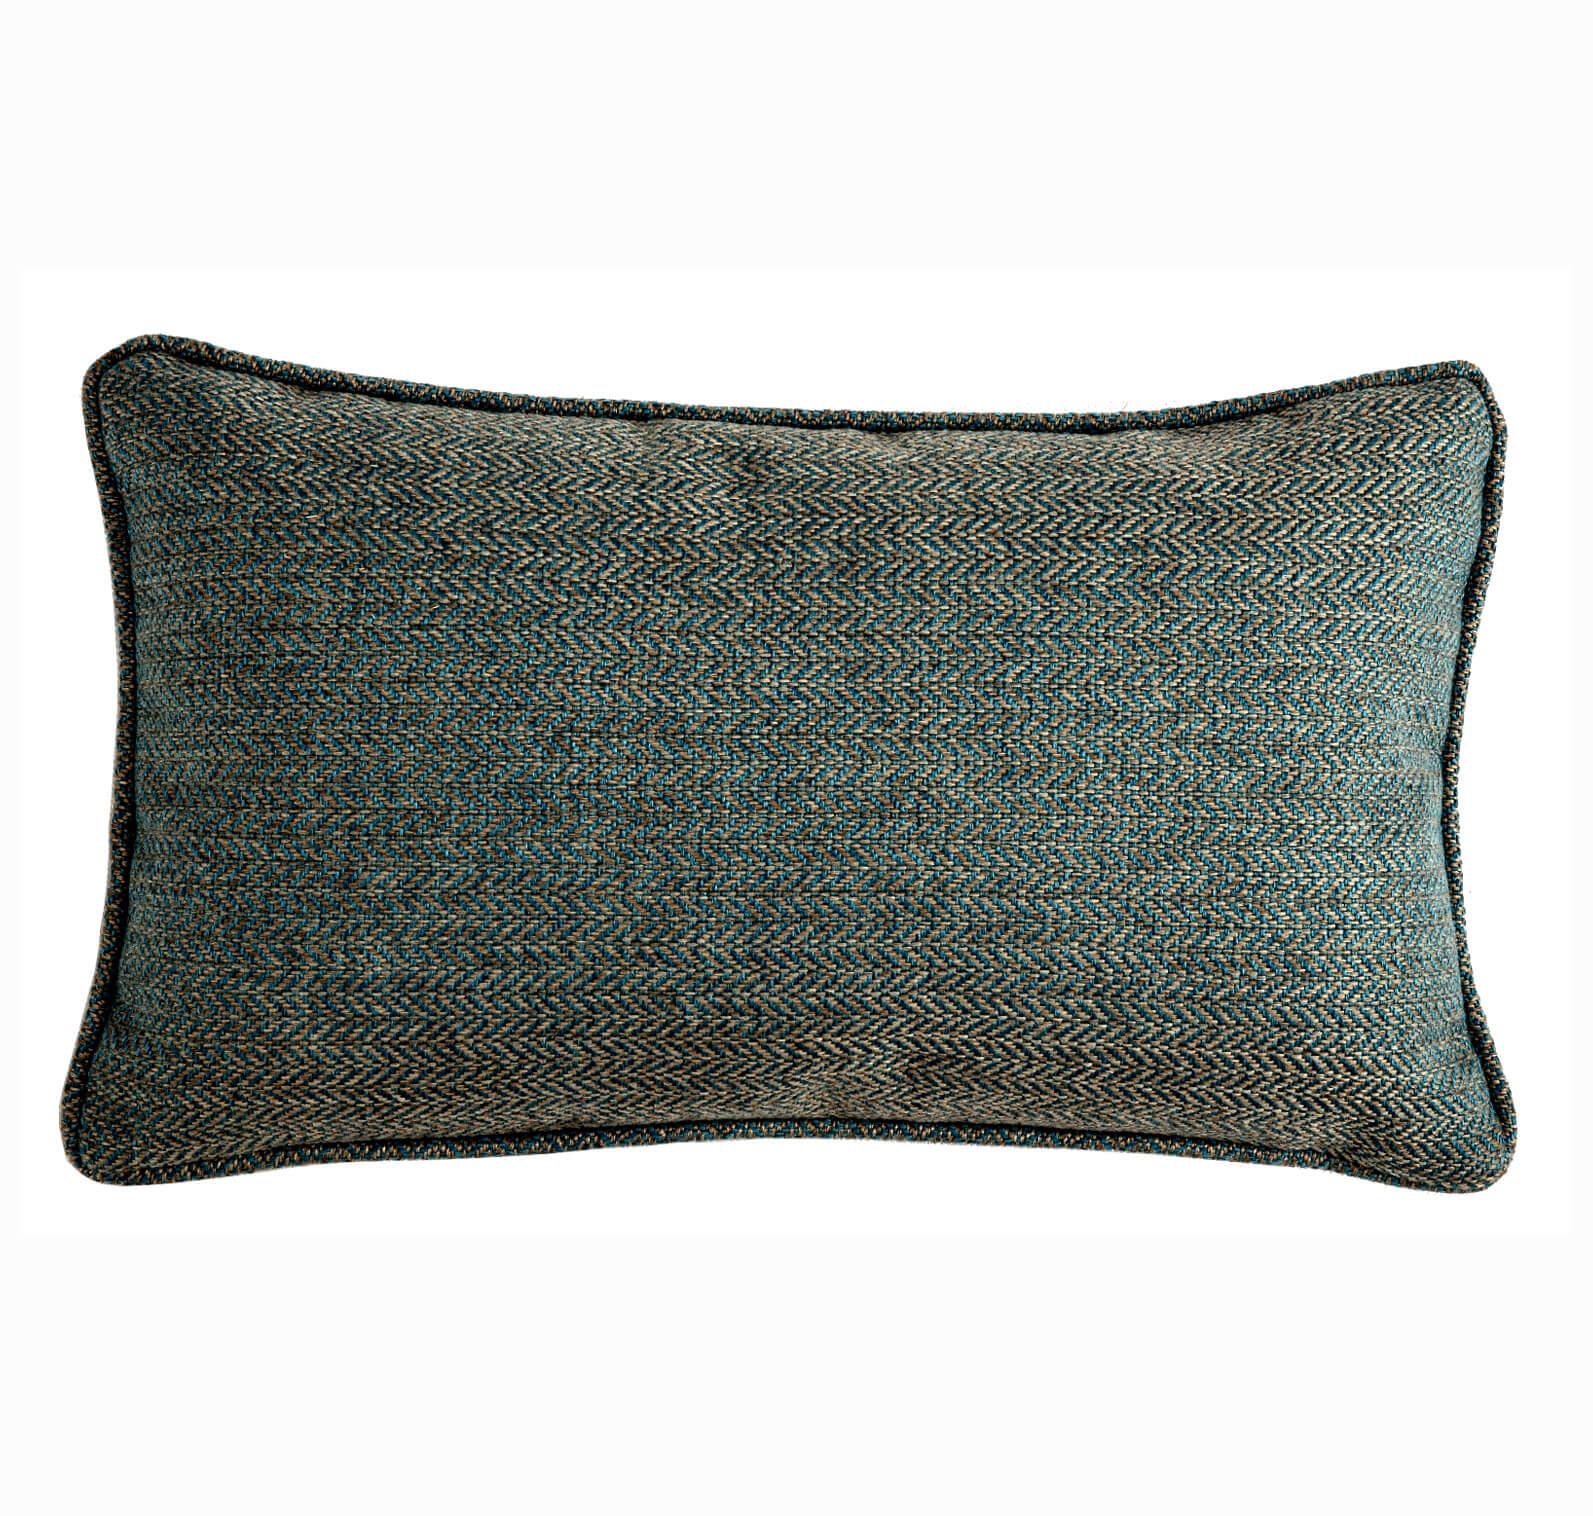 366 Kissen Rectangle – Kollektion Tweed